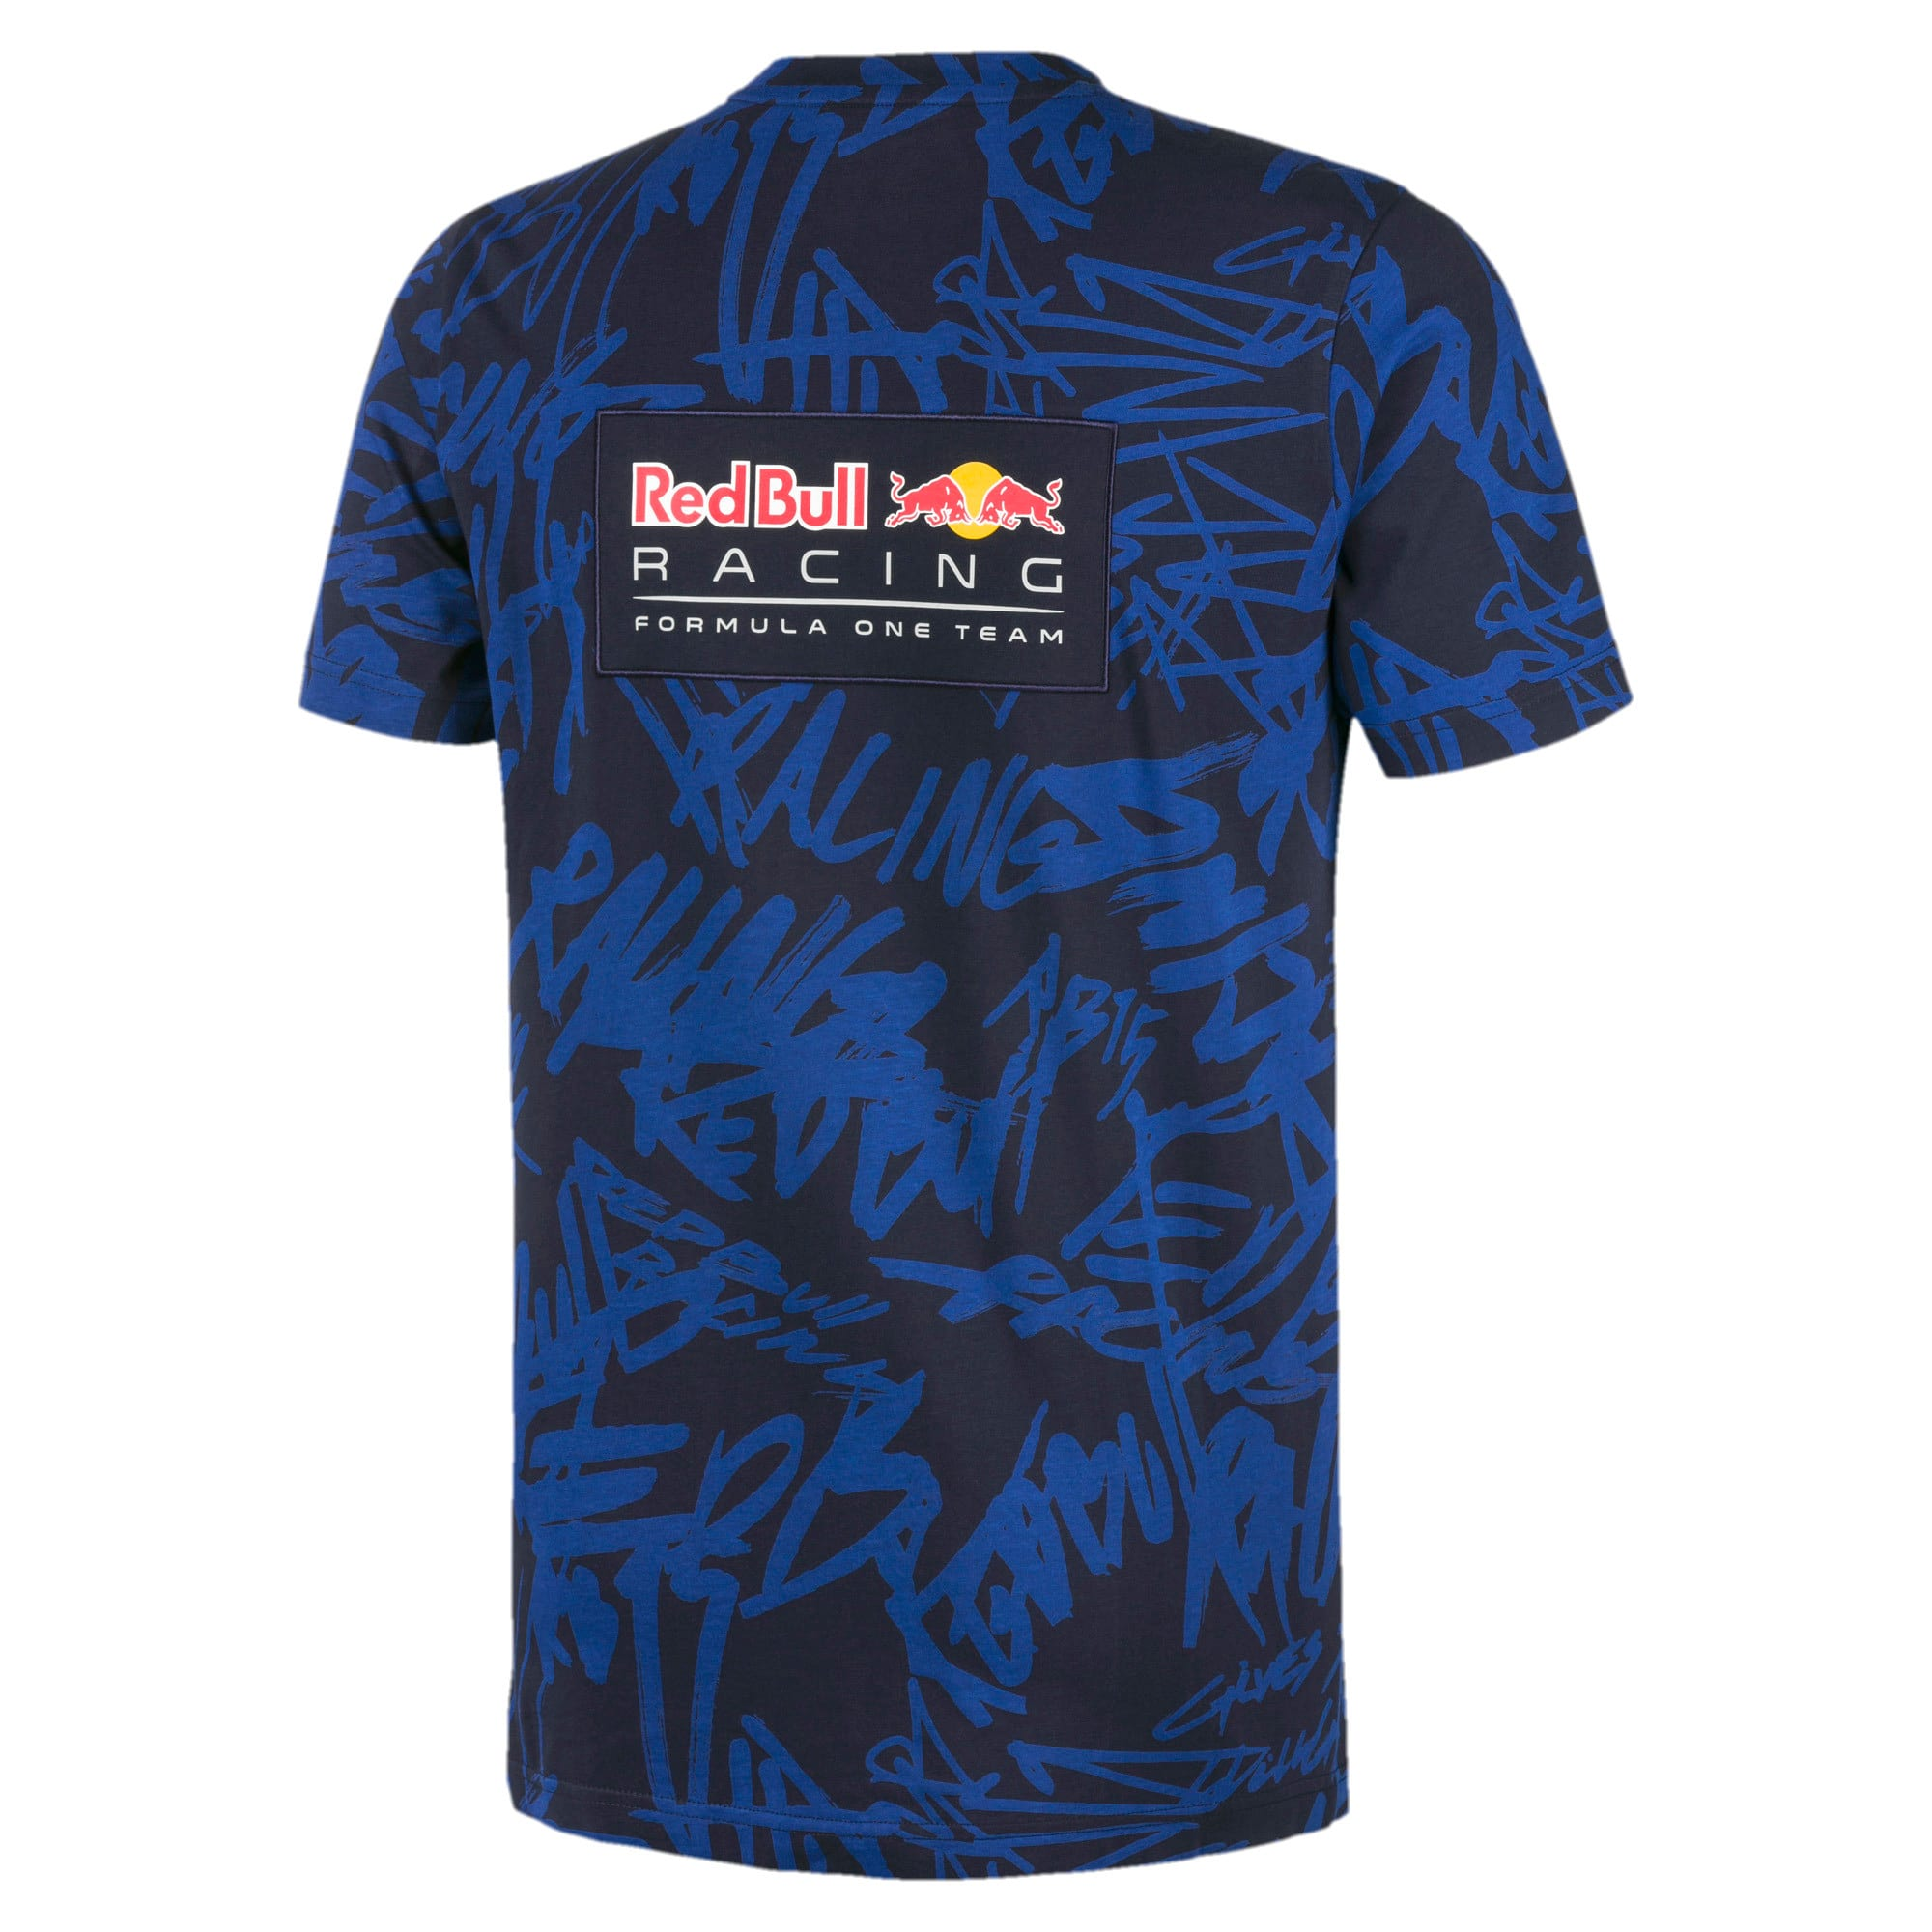 Thumbnail 5 of Red Bull Racing T-shirt voor heren, NIGHT SKY, medium